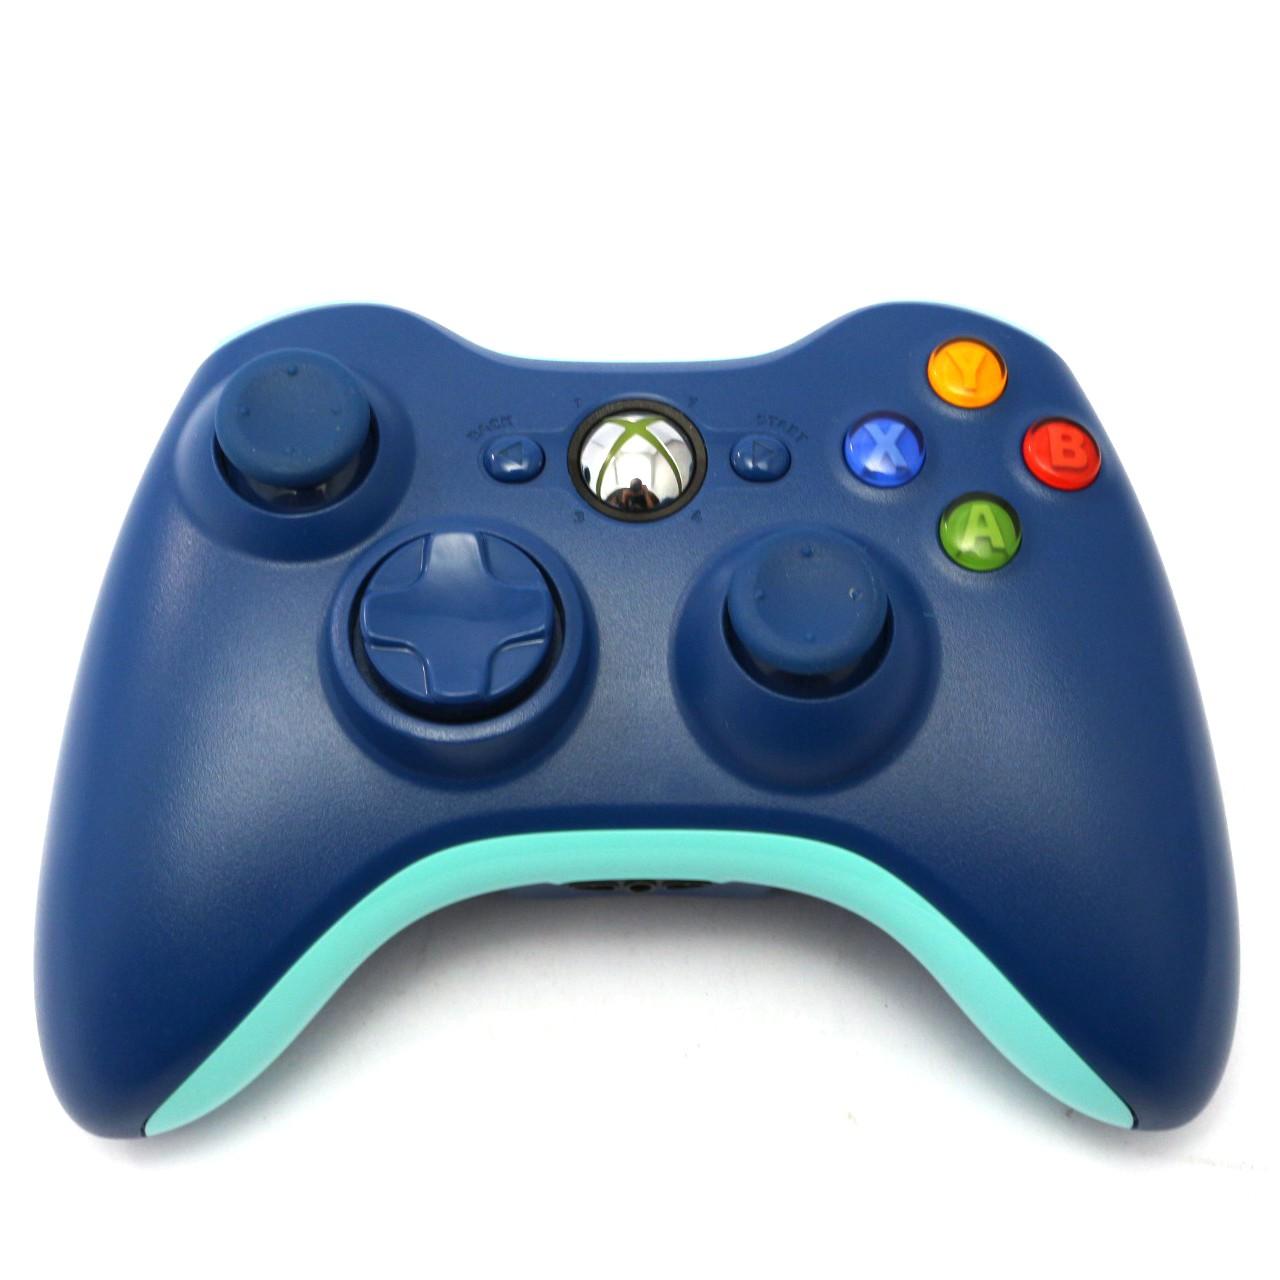 Original Wireless Controller #Arctic Blue / blau [Microsoft]